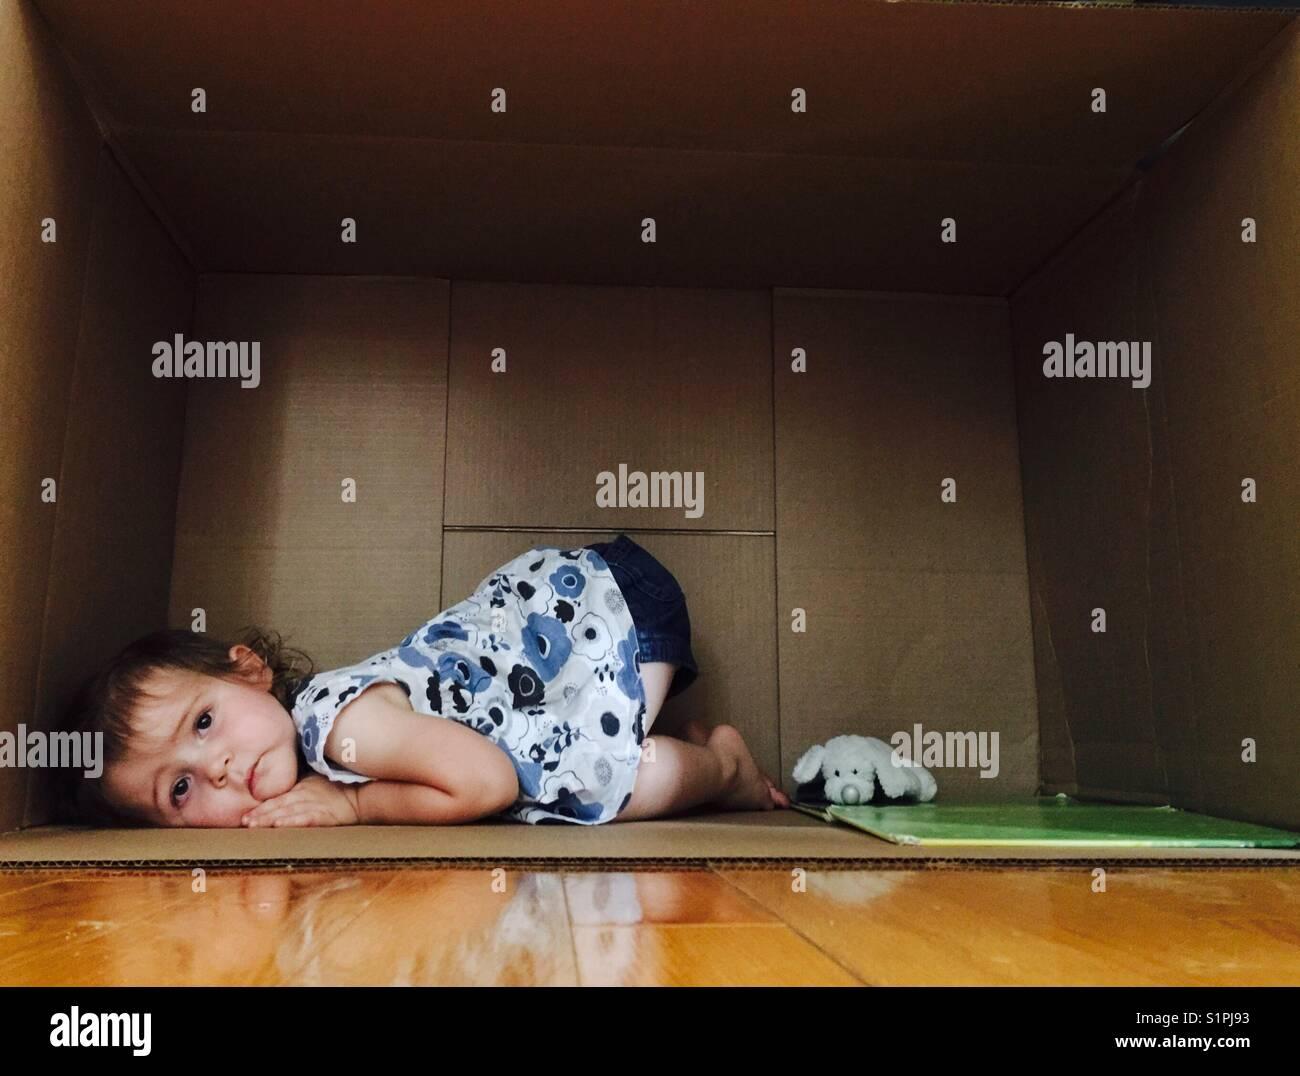 Sad toddler girl in a cardboard box - Stock Image